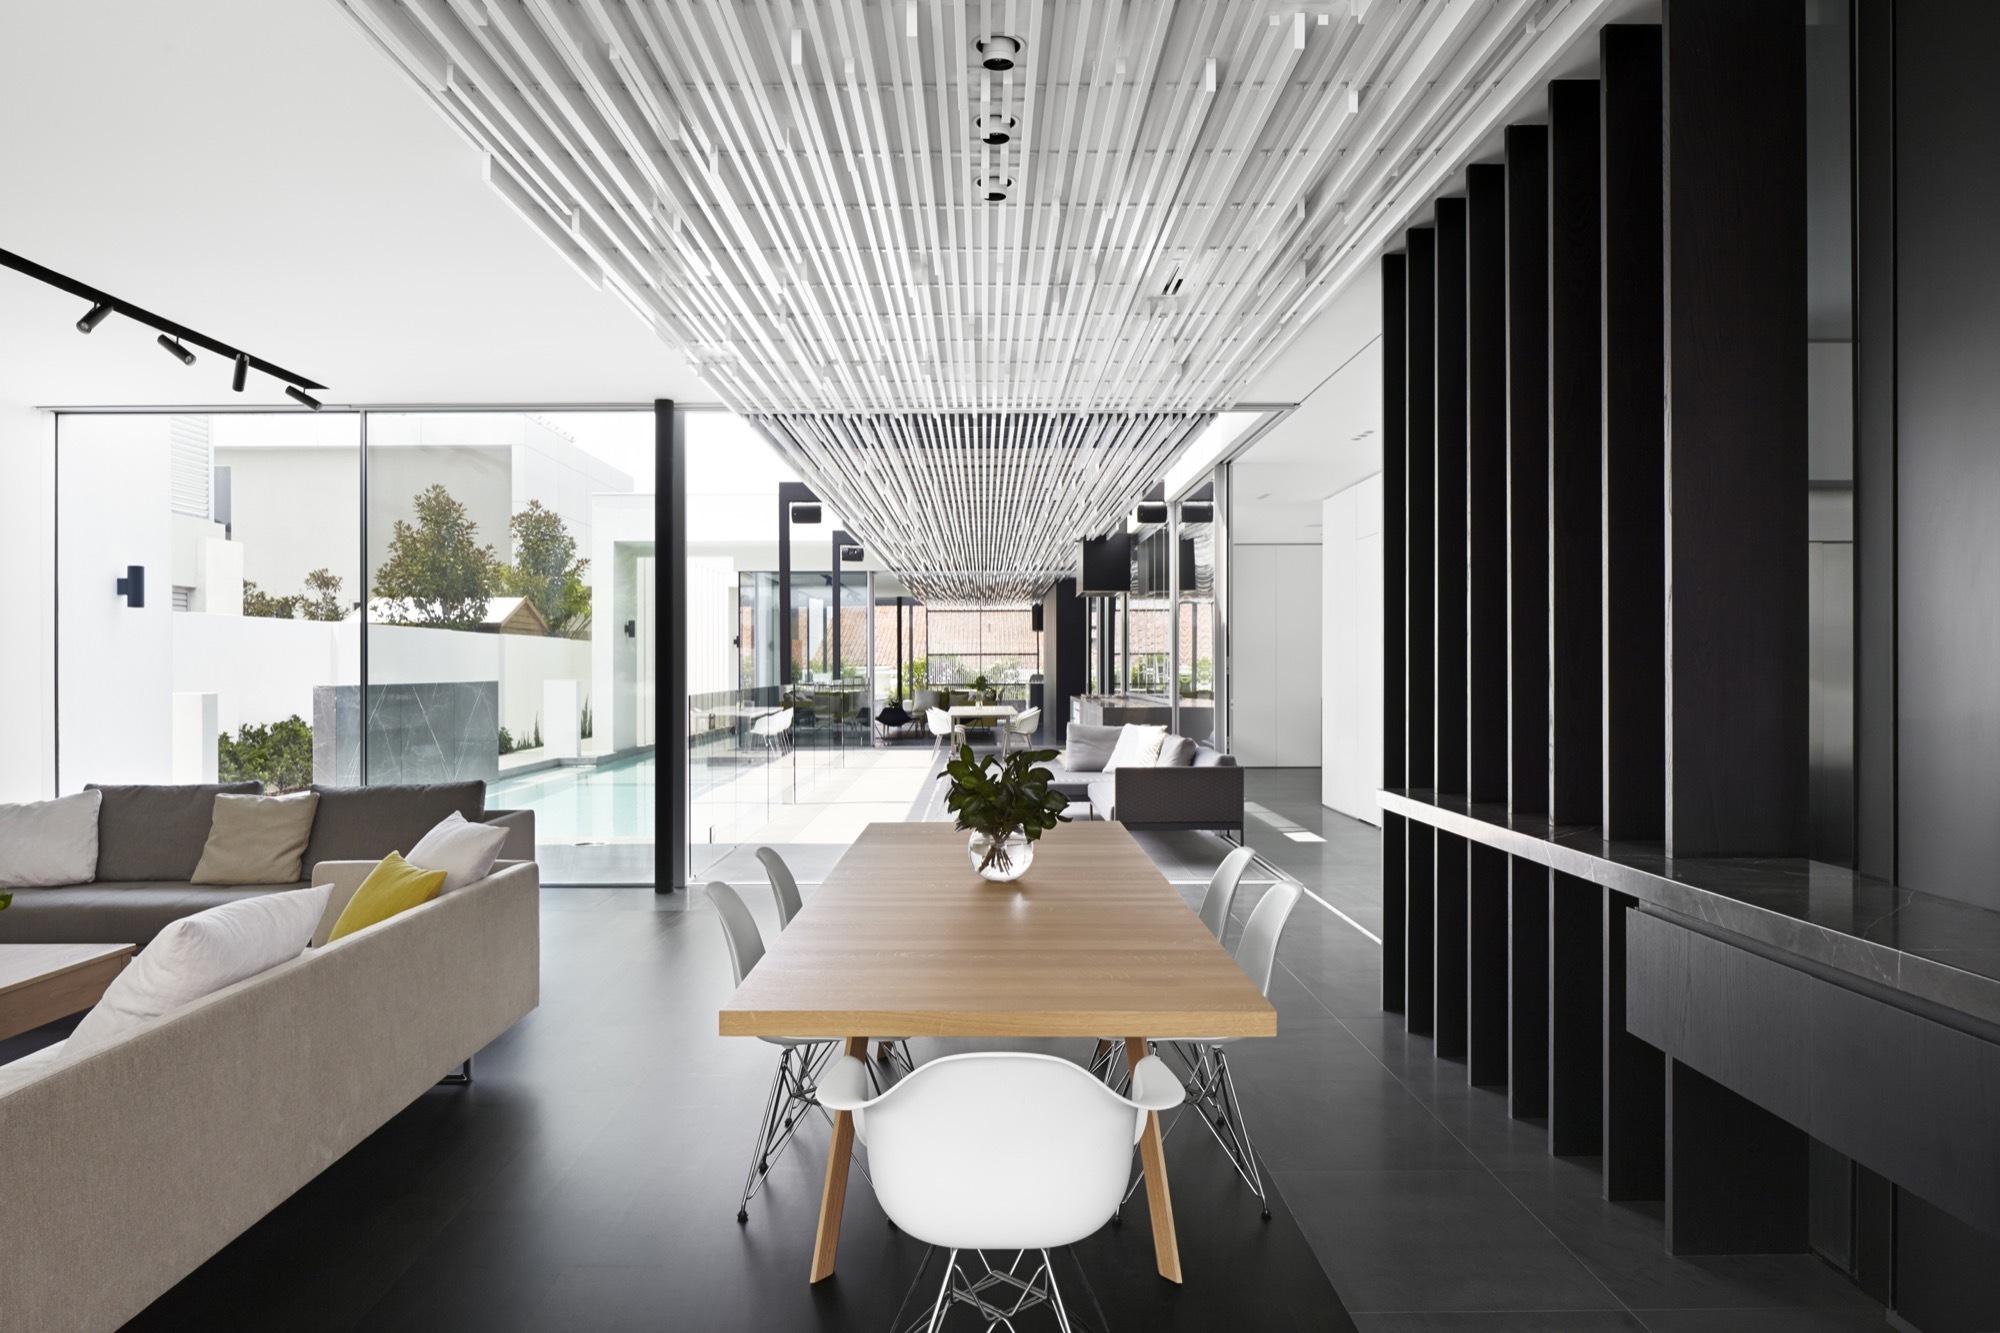 House Csa Craig Steere Architects - 1